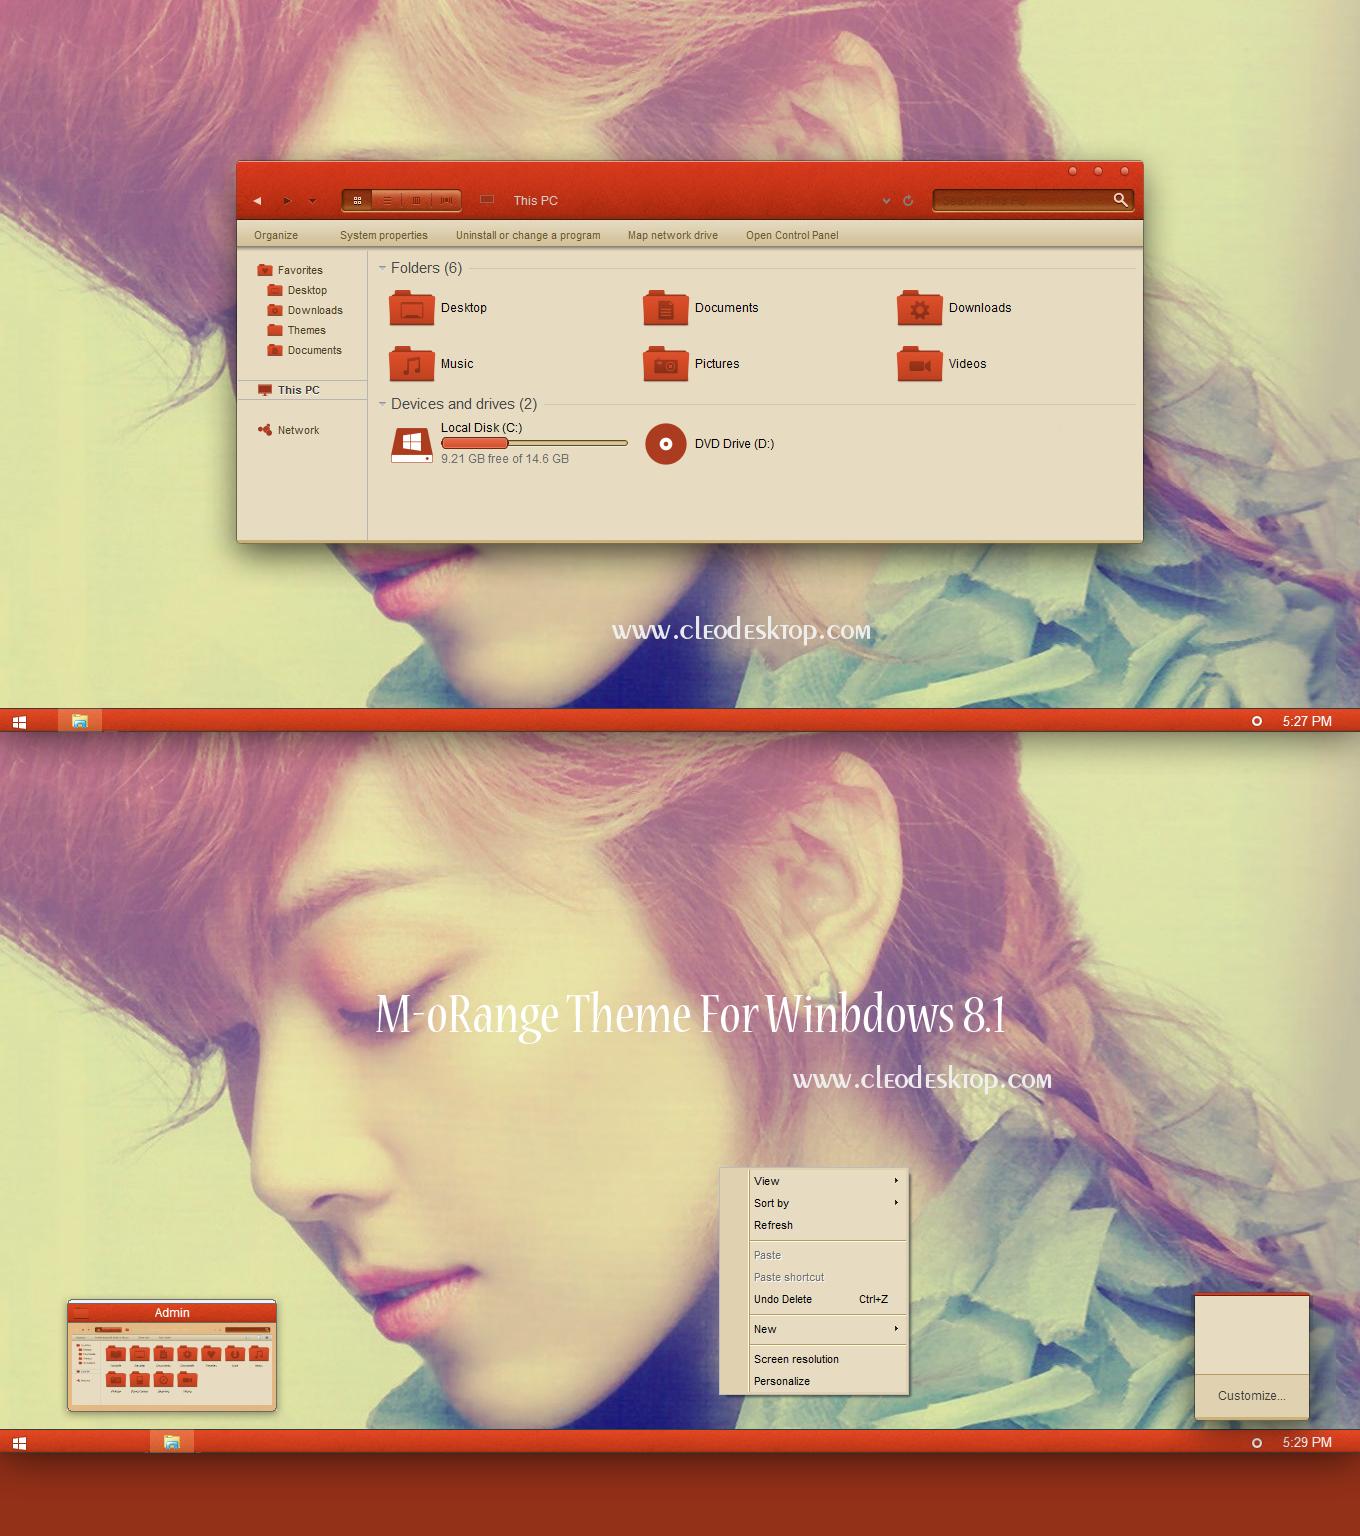 http://orig09.deviantart.net/a5b5/f/2015/145/8/2/m_orange_theme_for_windows_8_1_by_cu88-d8uomb5.png